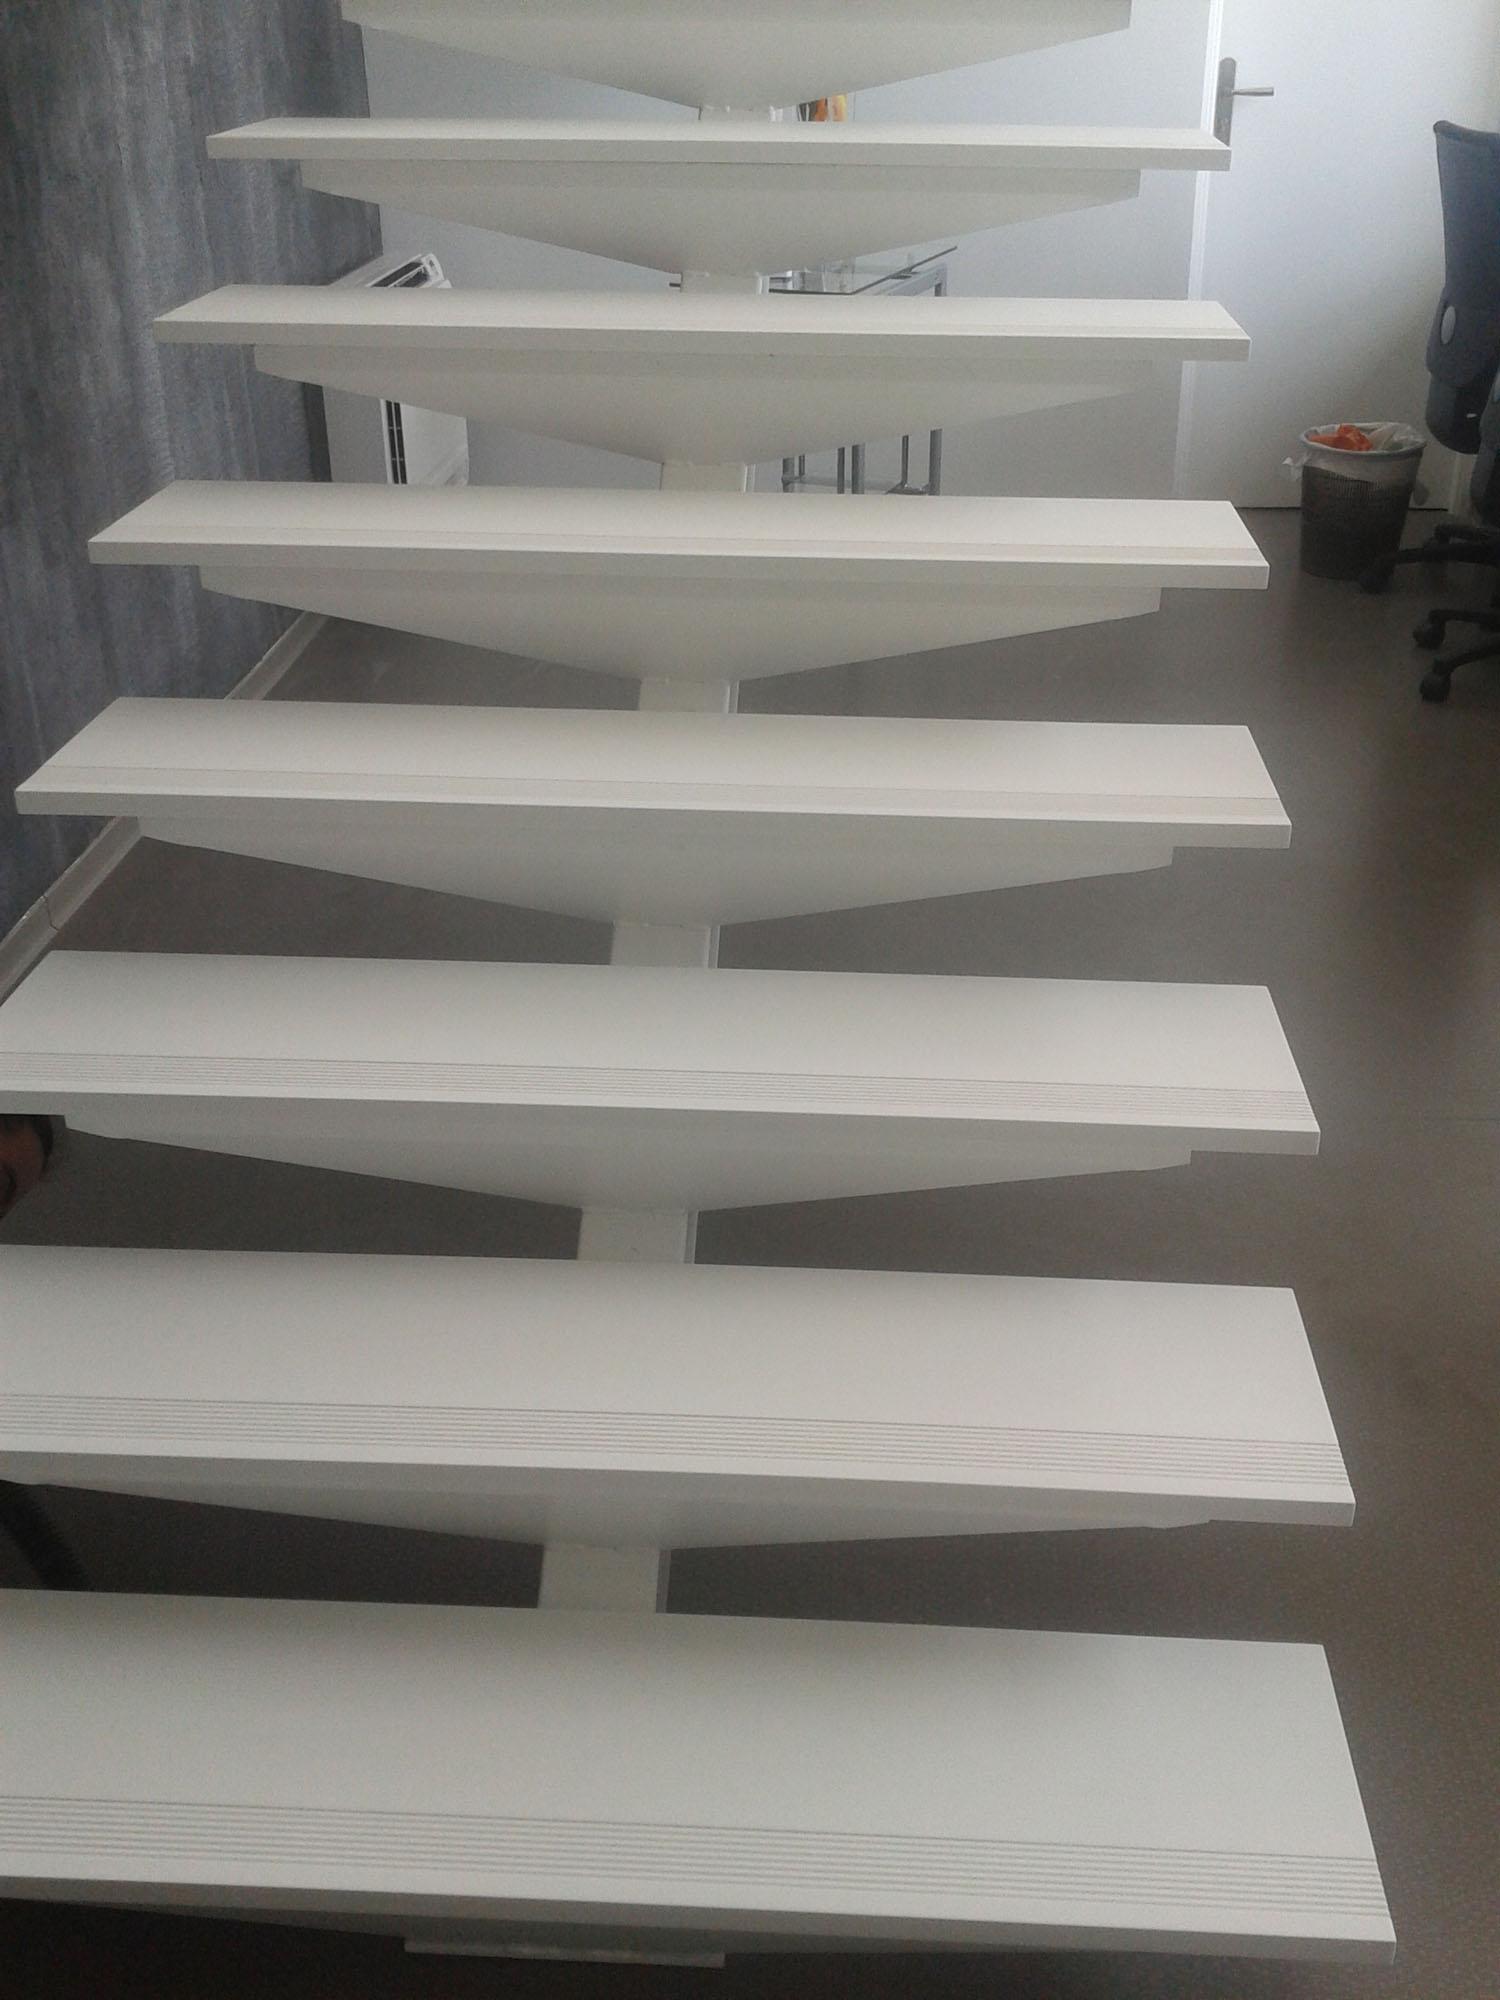 Conception d 39 un escalier en en pierre acrylique naturelle for Escalier en pierre naturelle